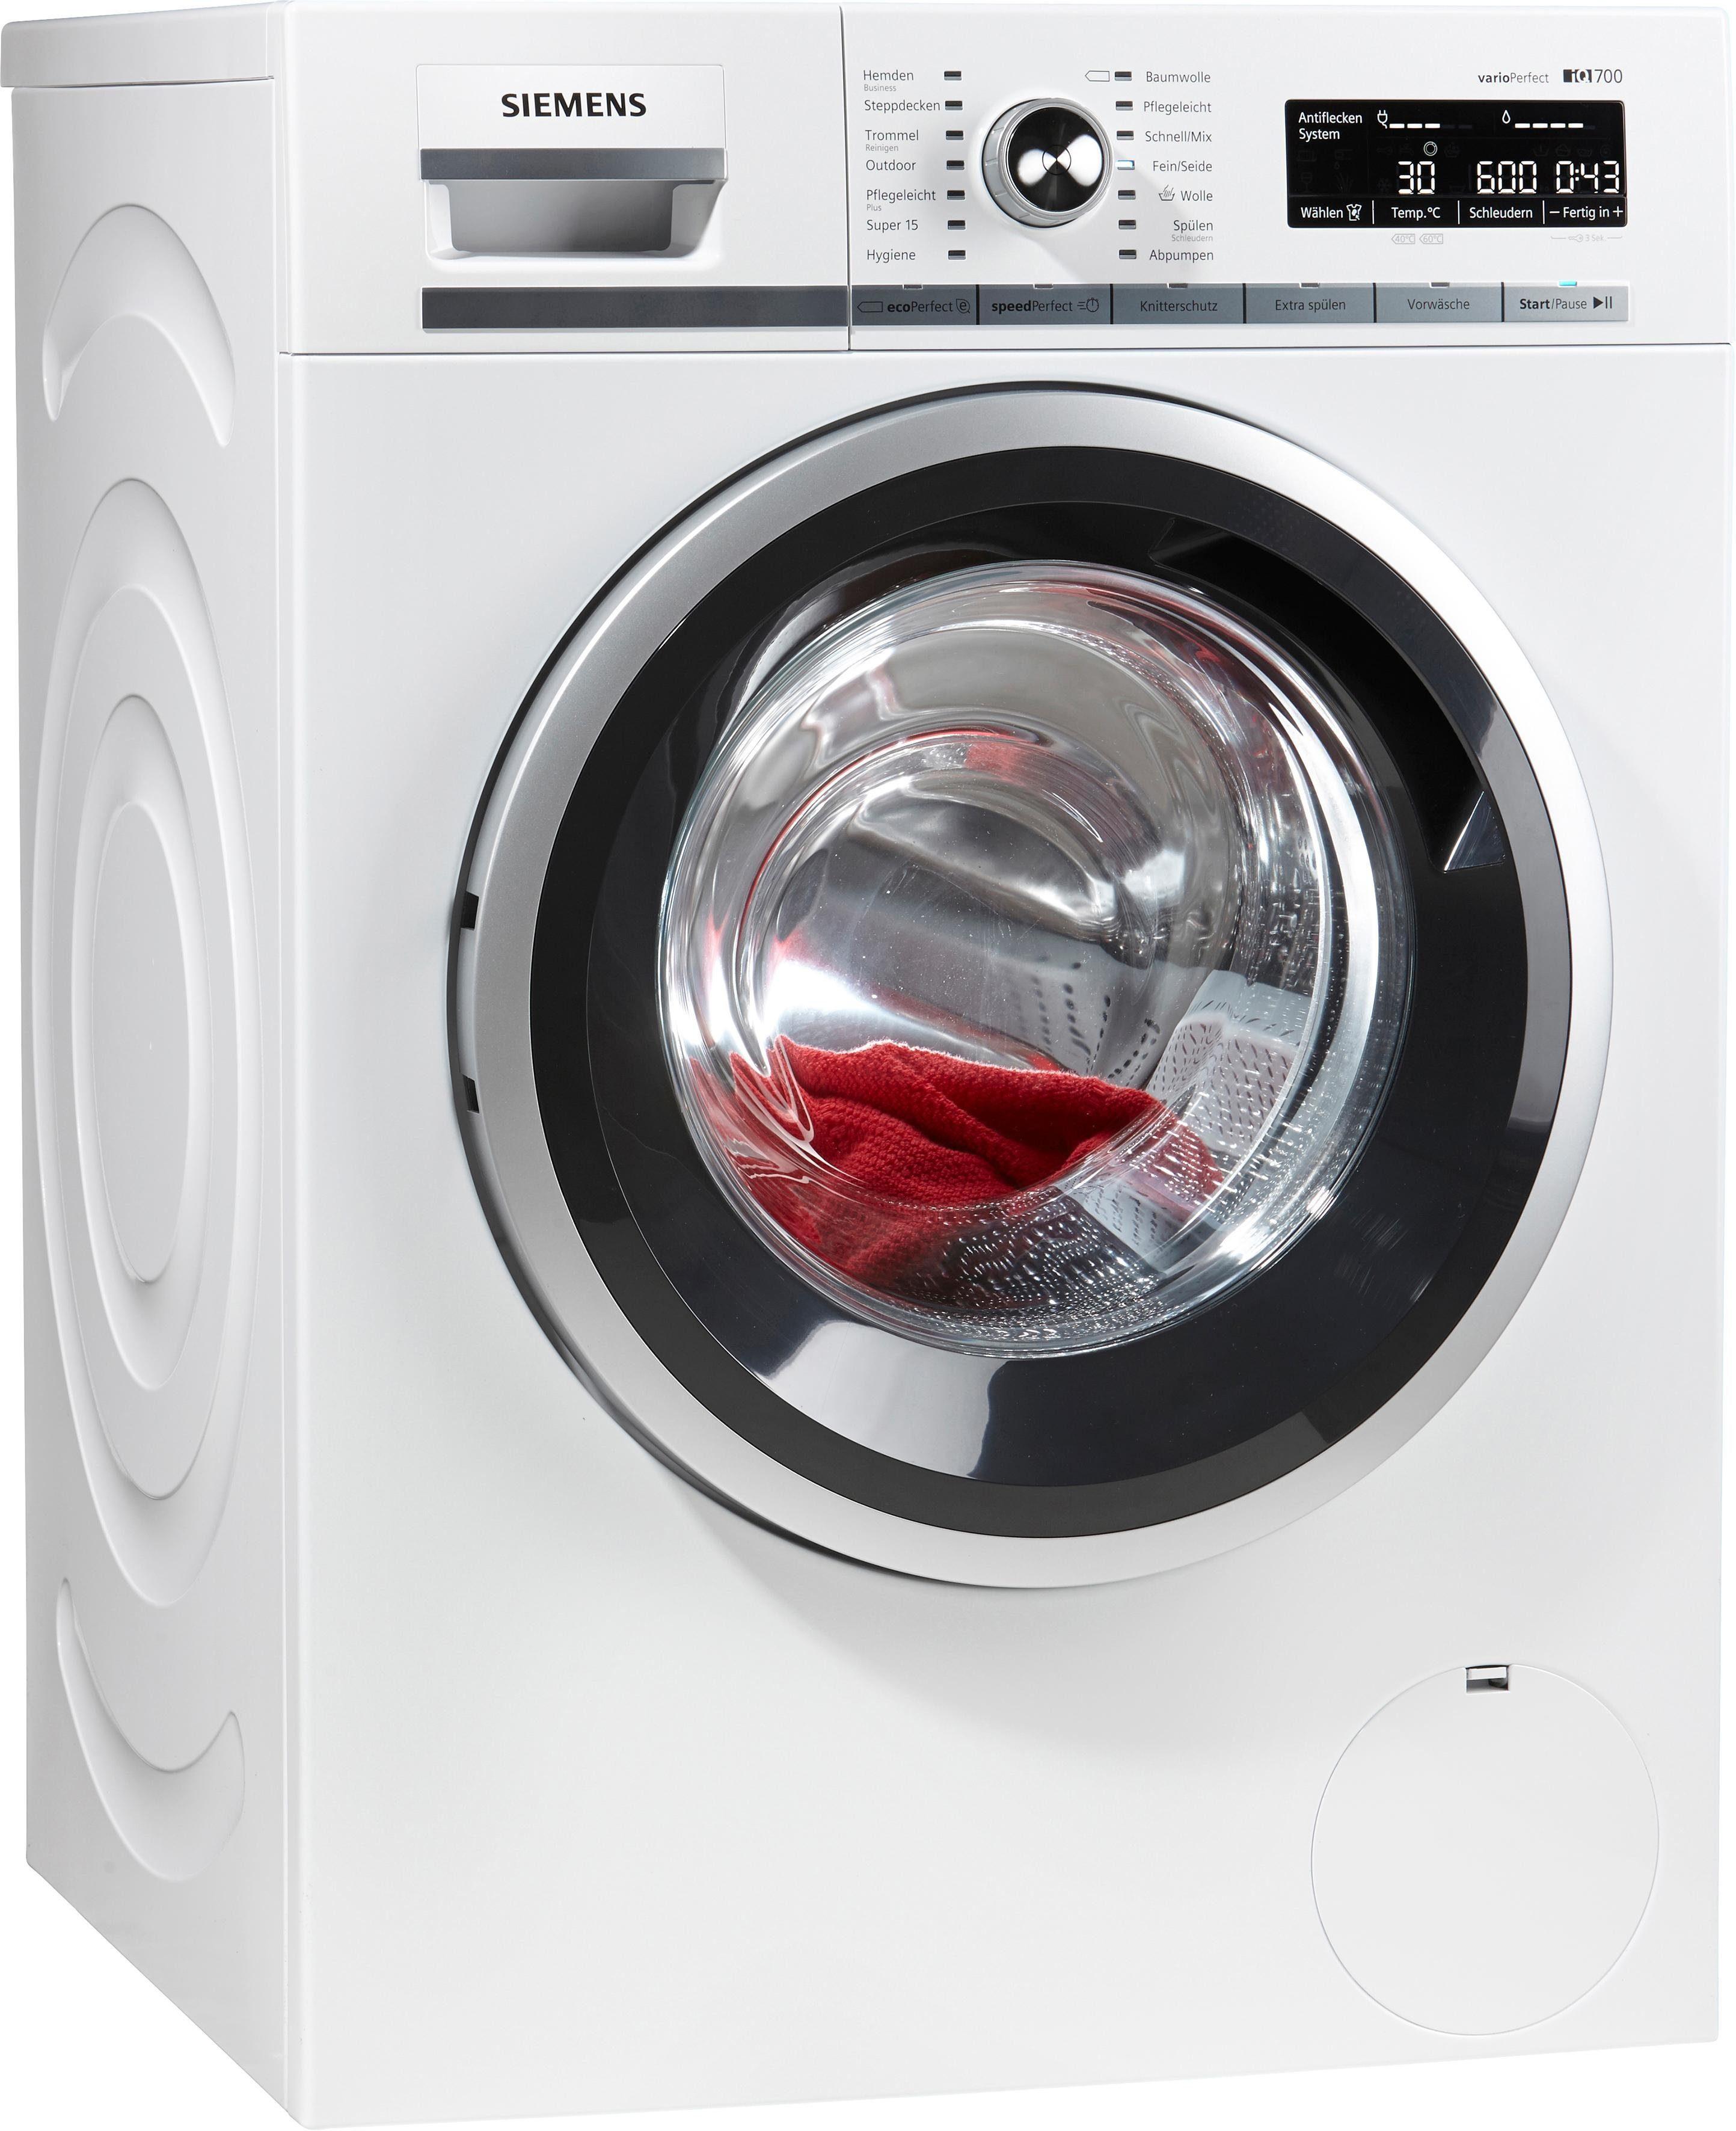 SIEMENS Waschmaschine iQ700 WM16W540, A+++, 8 kg, 1600 U/Min